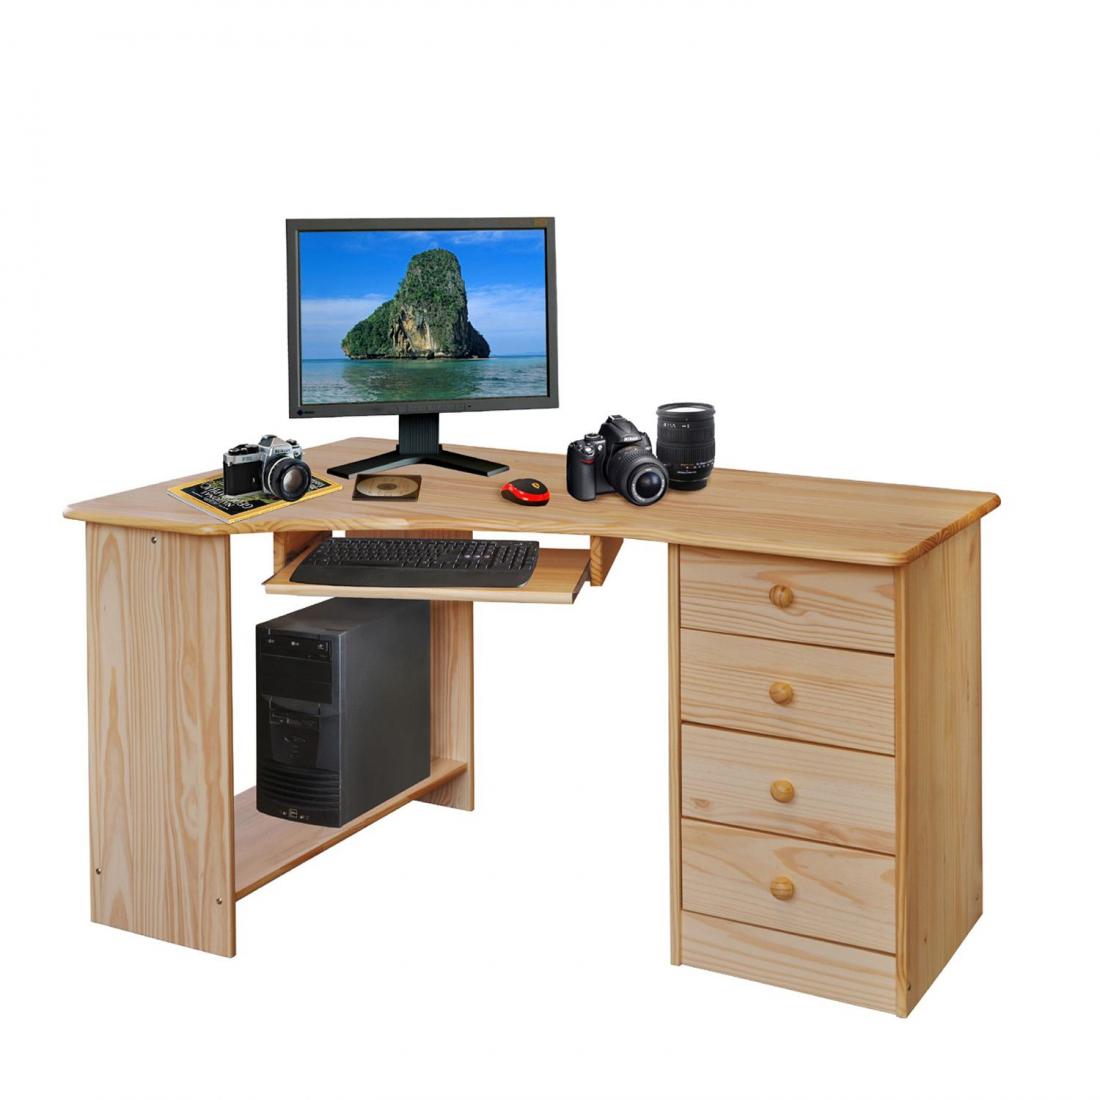 <![CDATA[PC stůl rohový 8846 masív borovice Idea]]>